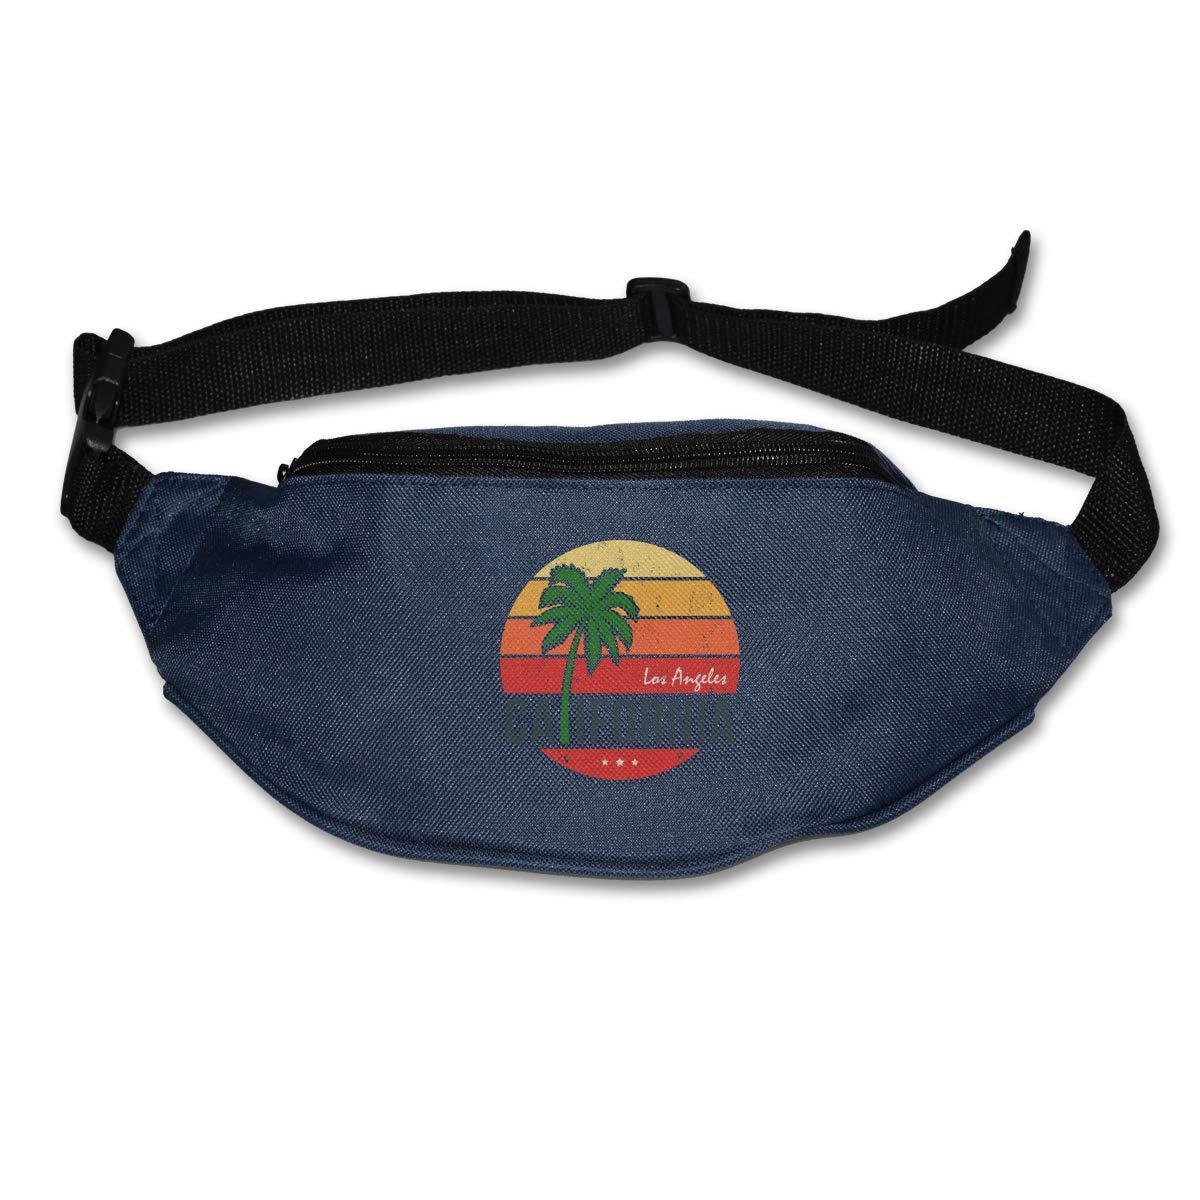 Los Angeles California Sport Waist Packs Fanny Pack Adjustable For Travel